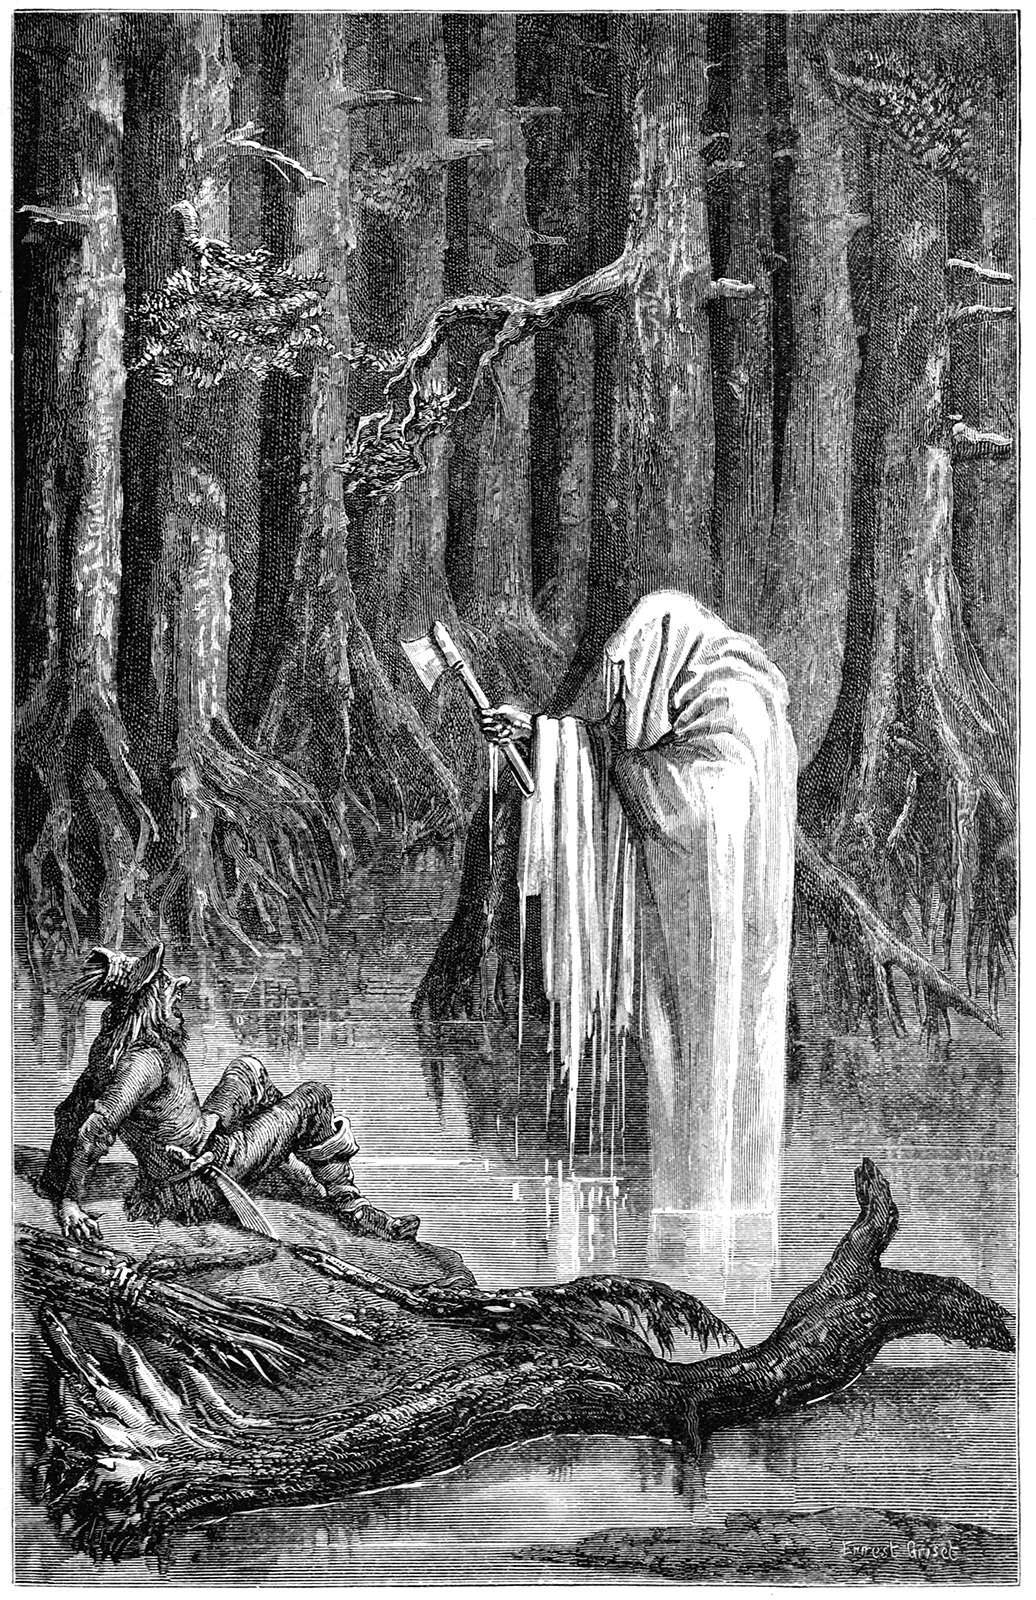 A ghostly figure haunts a woodsman